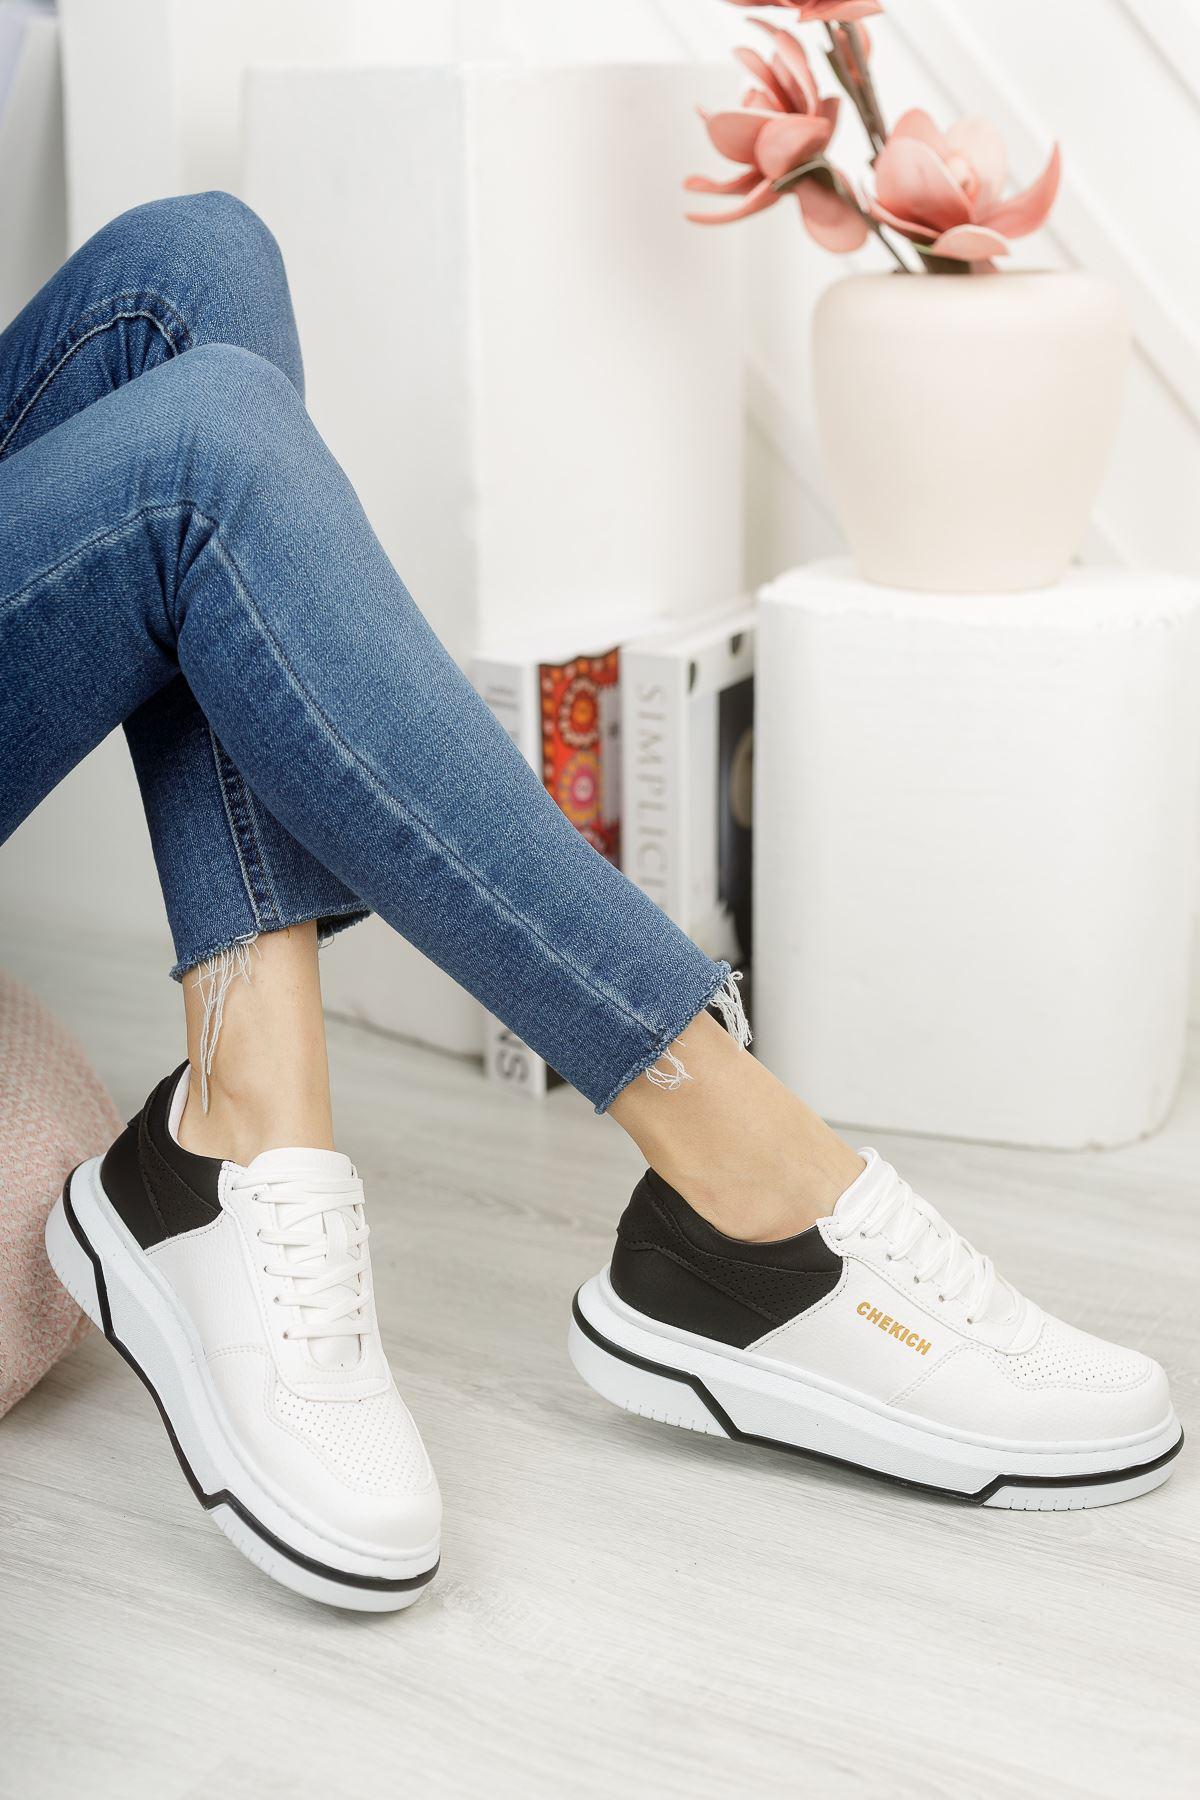 Chekich CH075 İpekyol BT Kadın Ayakkabı BEYAZ/SİYAH